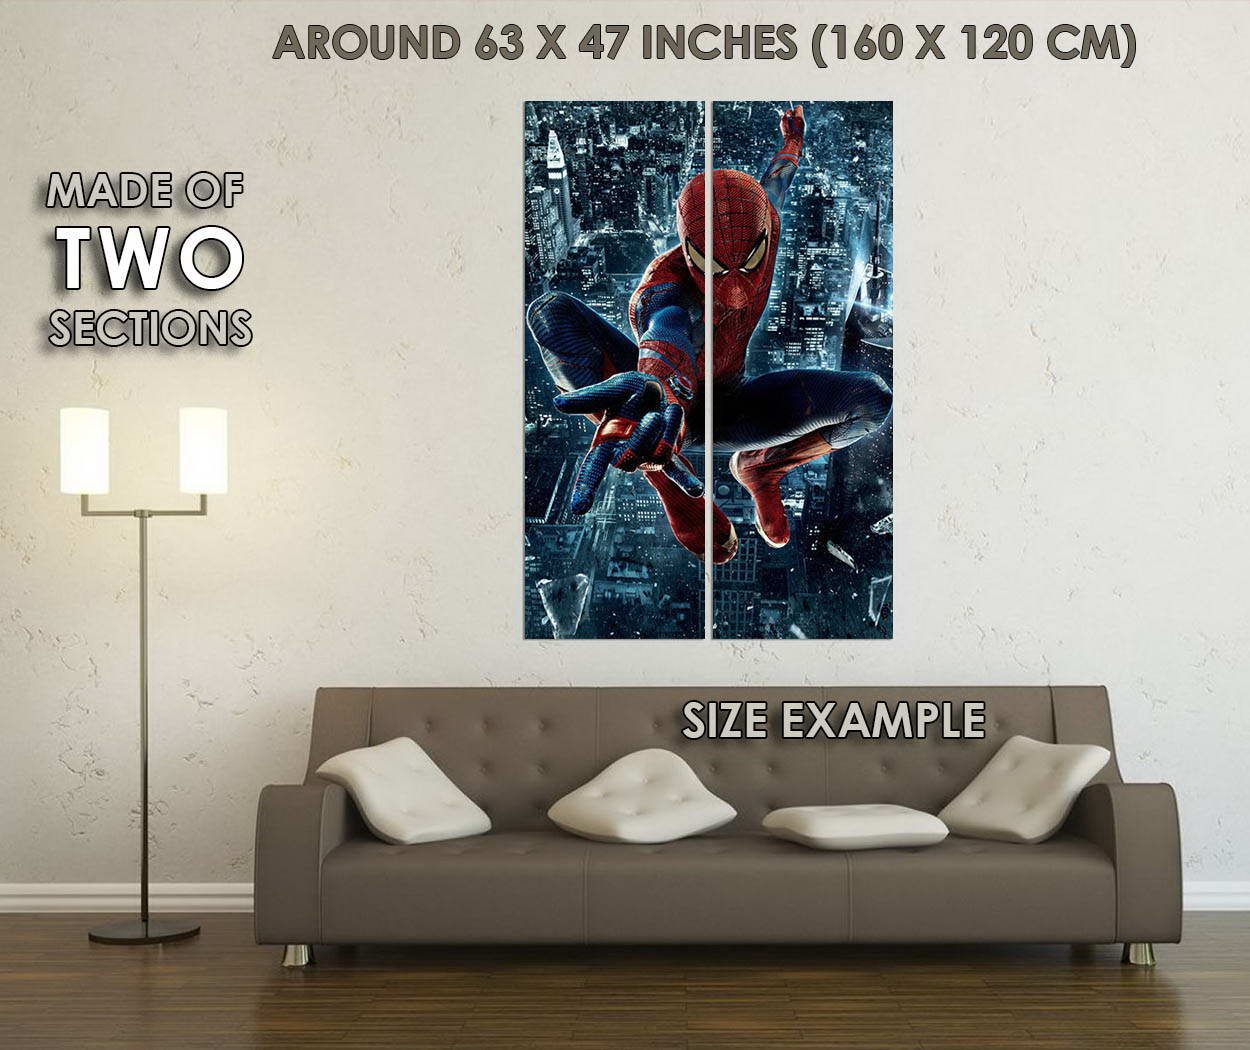 10269-The-Amazing-Spider-Man-Movie-Art-LAMINATED-POSTER-CA thumbnail 6